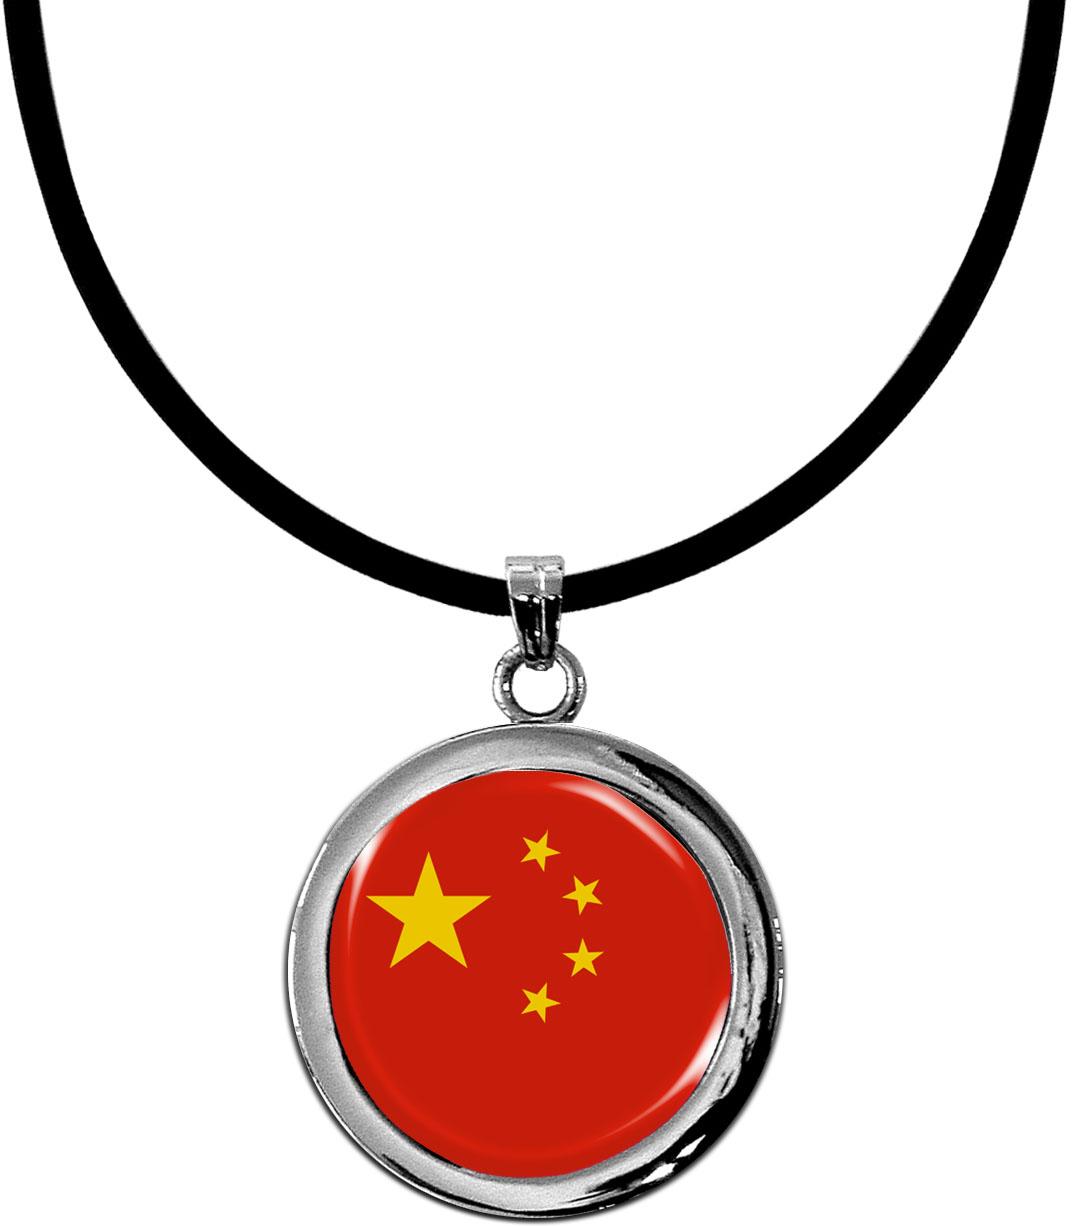 Kettenanhänger / China / Silikonband mit Silberverschluss